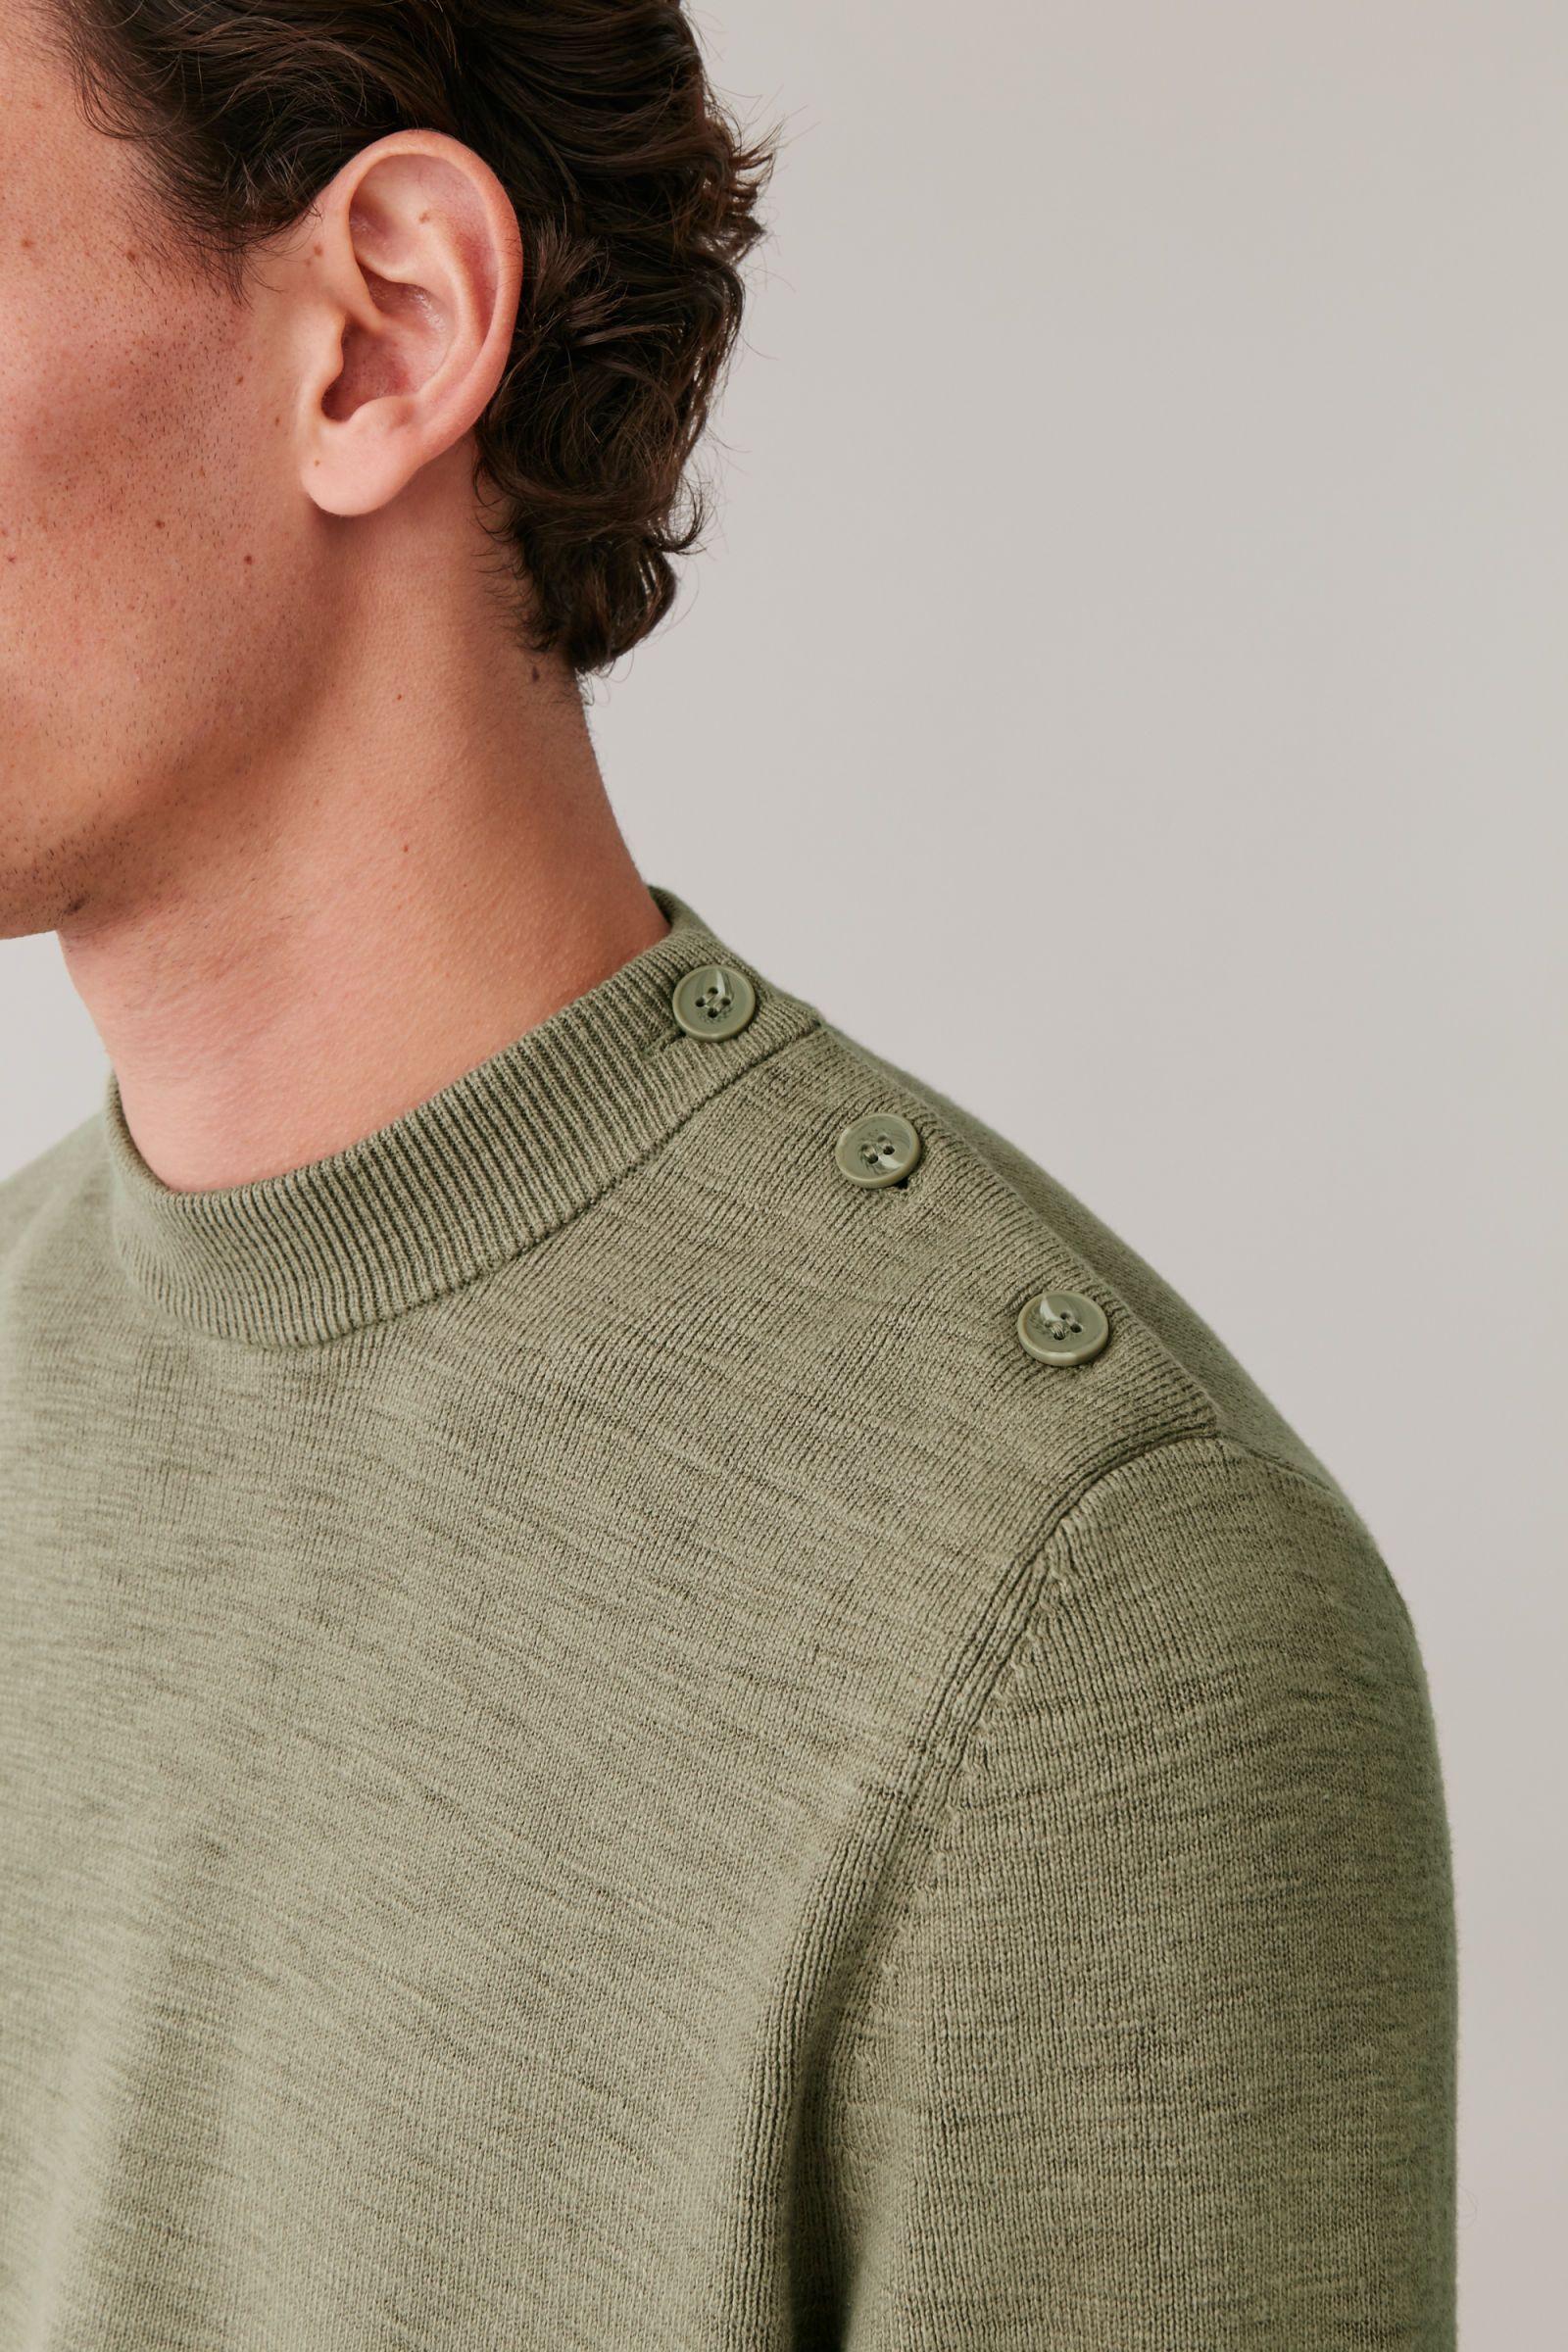 COS | New Year Wishlist in 2020 | Cotton sweater, Knitwear